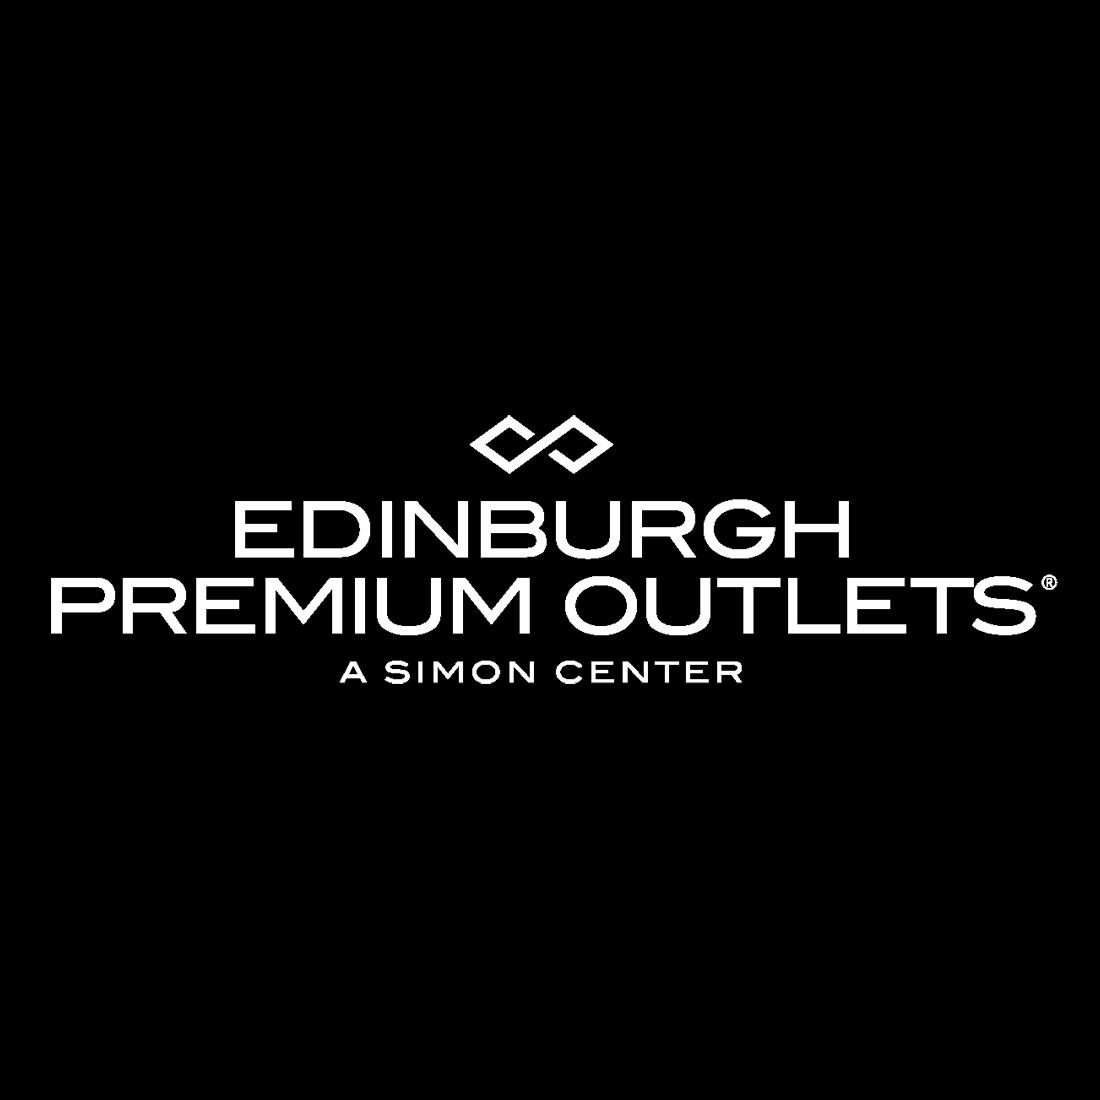 Edinburgh outlet coupons 2019